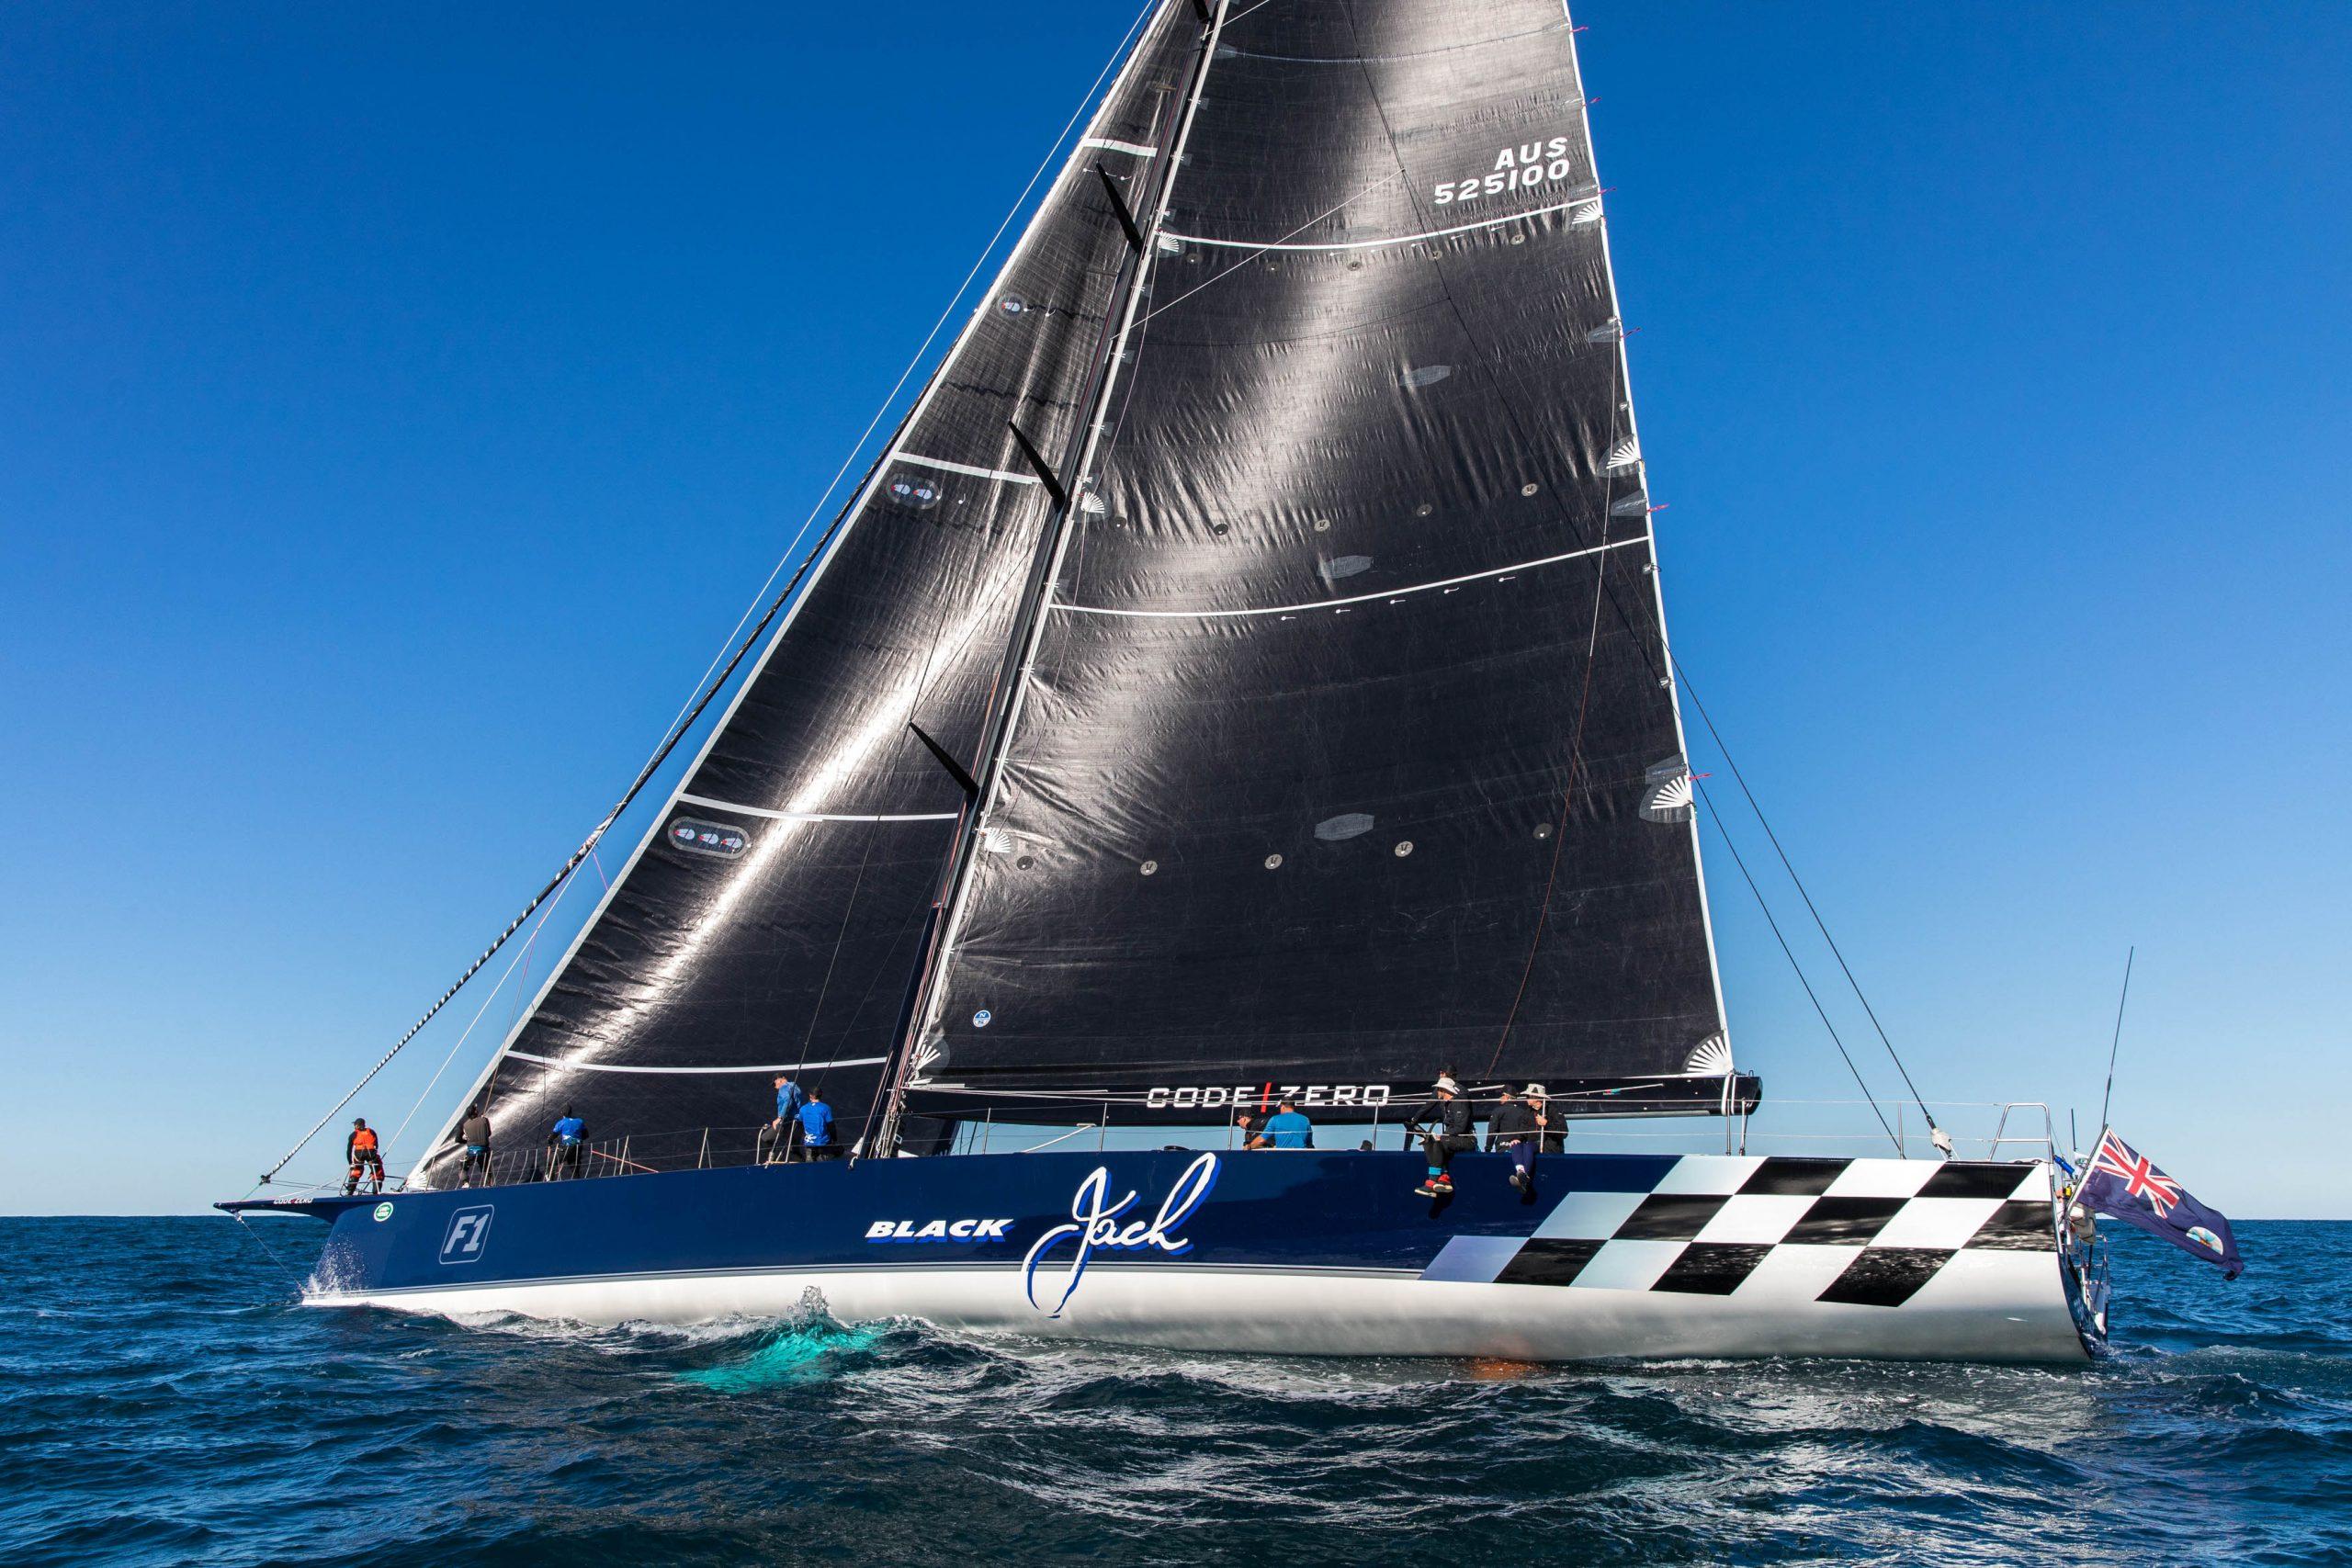 Black Jack in race mode - credit Andrea Francolini.